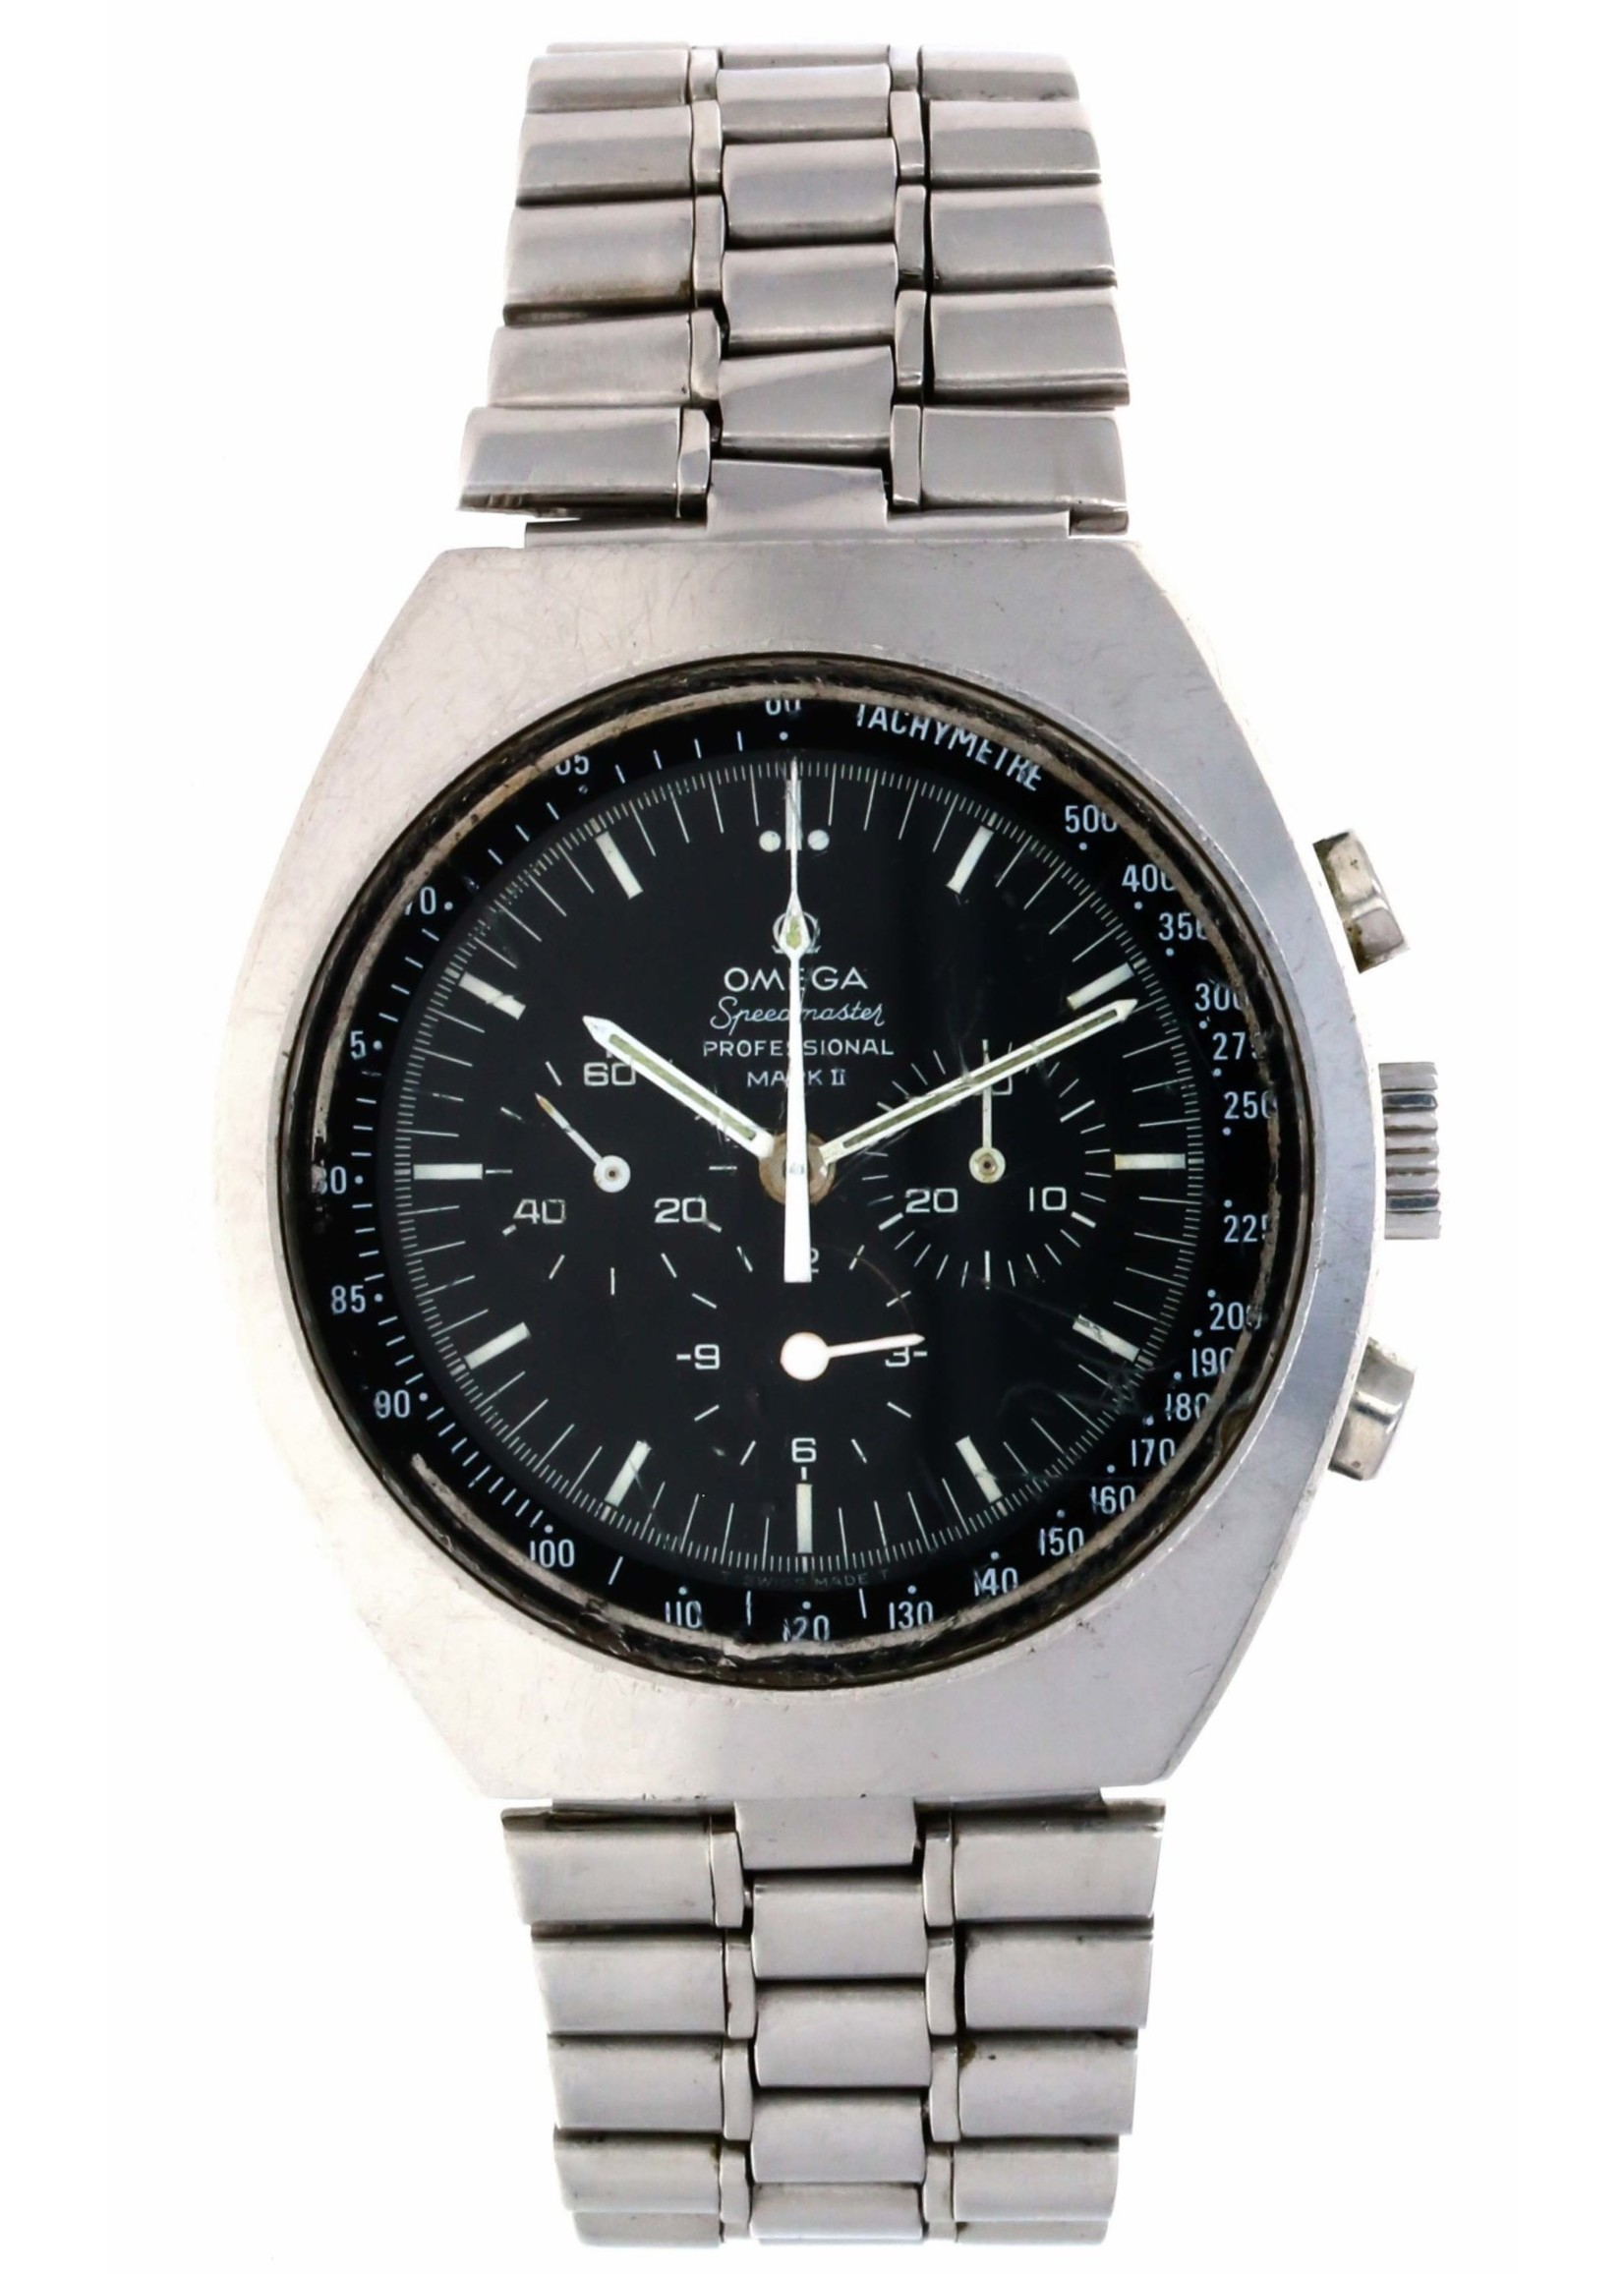 Omega Watches OMEGA SPEEDMASTER MARK II #145.014